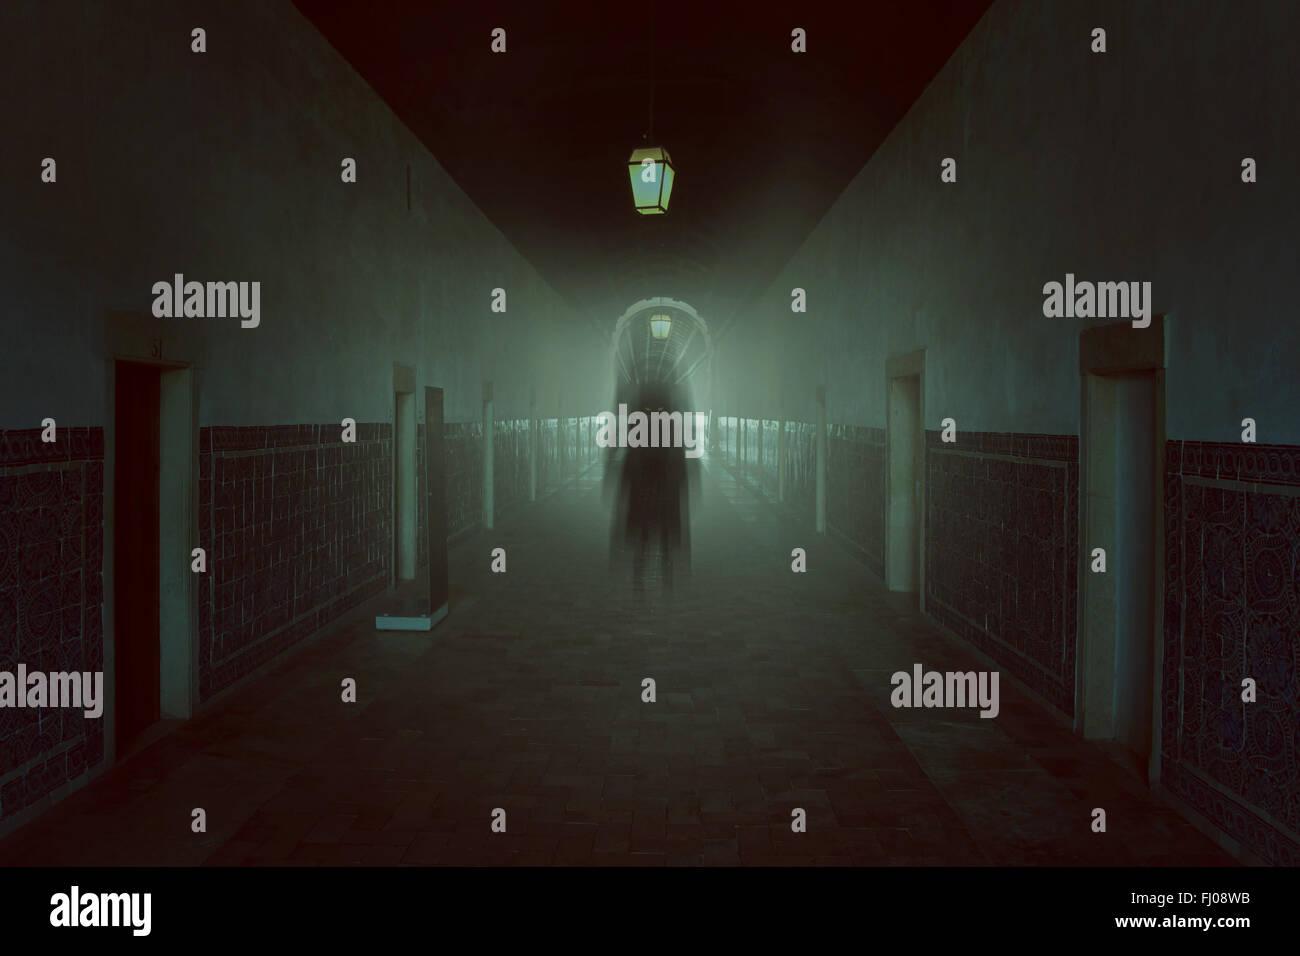 Böse Schatten in haunted Gebäude. Halloween und Horror Töne Stockbild